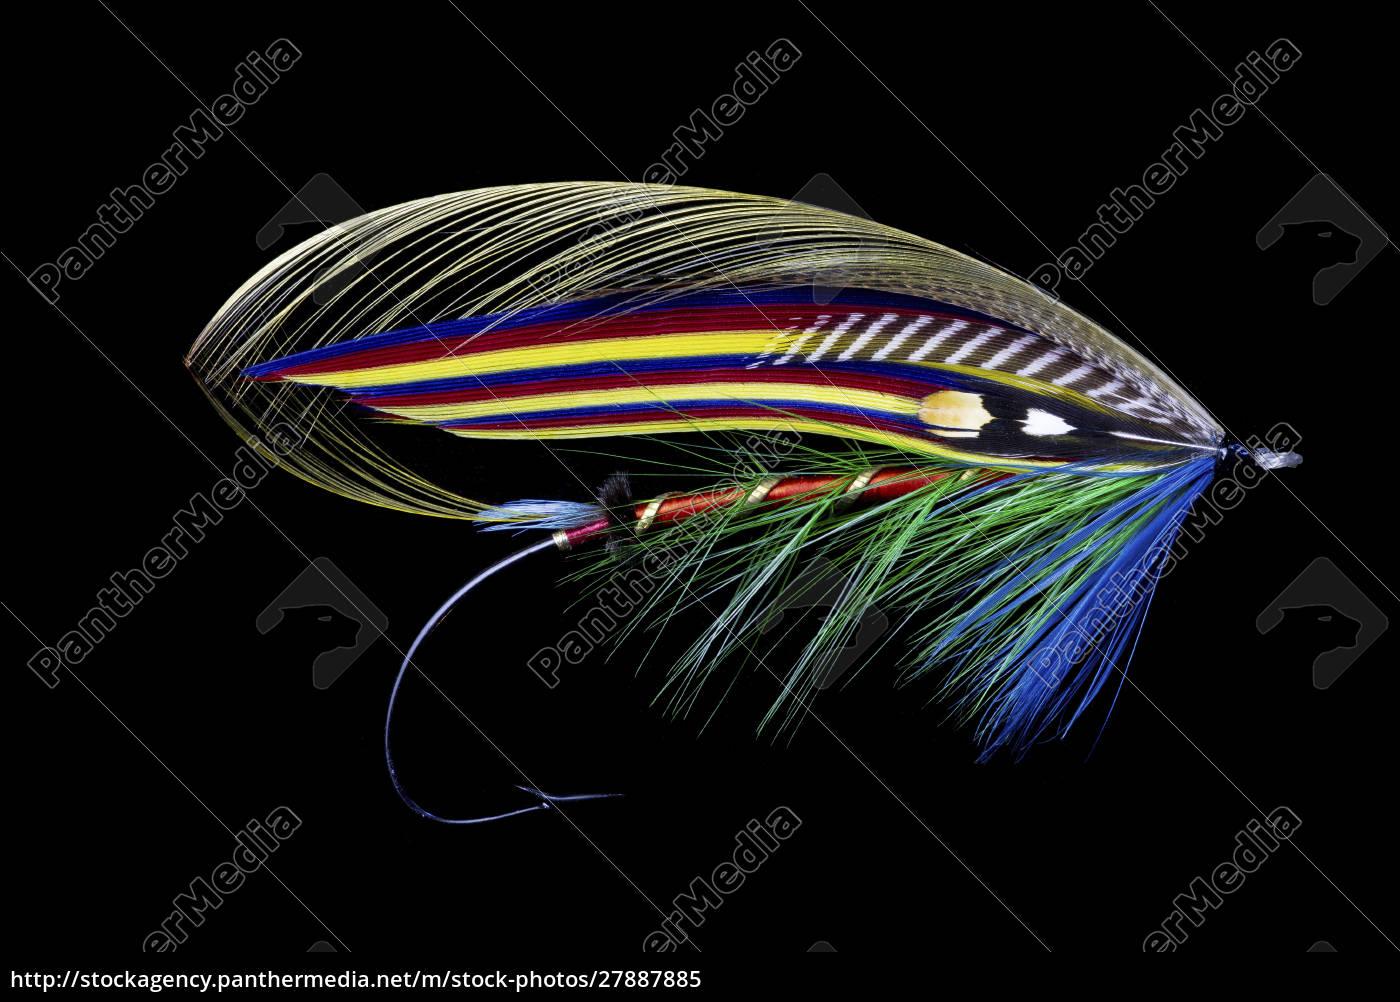 atlantic, salmon, fly, designs, 'clabby' - 27887885